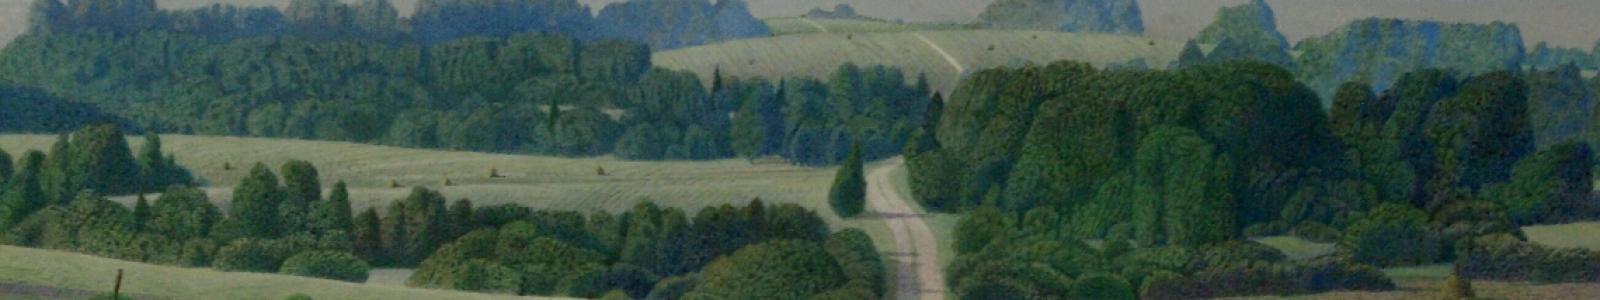 Gallery Painter Vladimir Likhachev